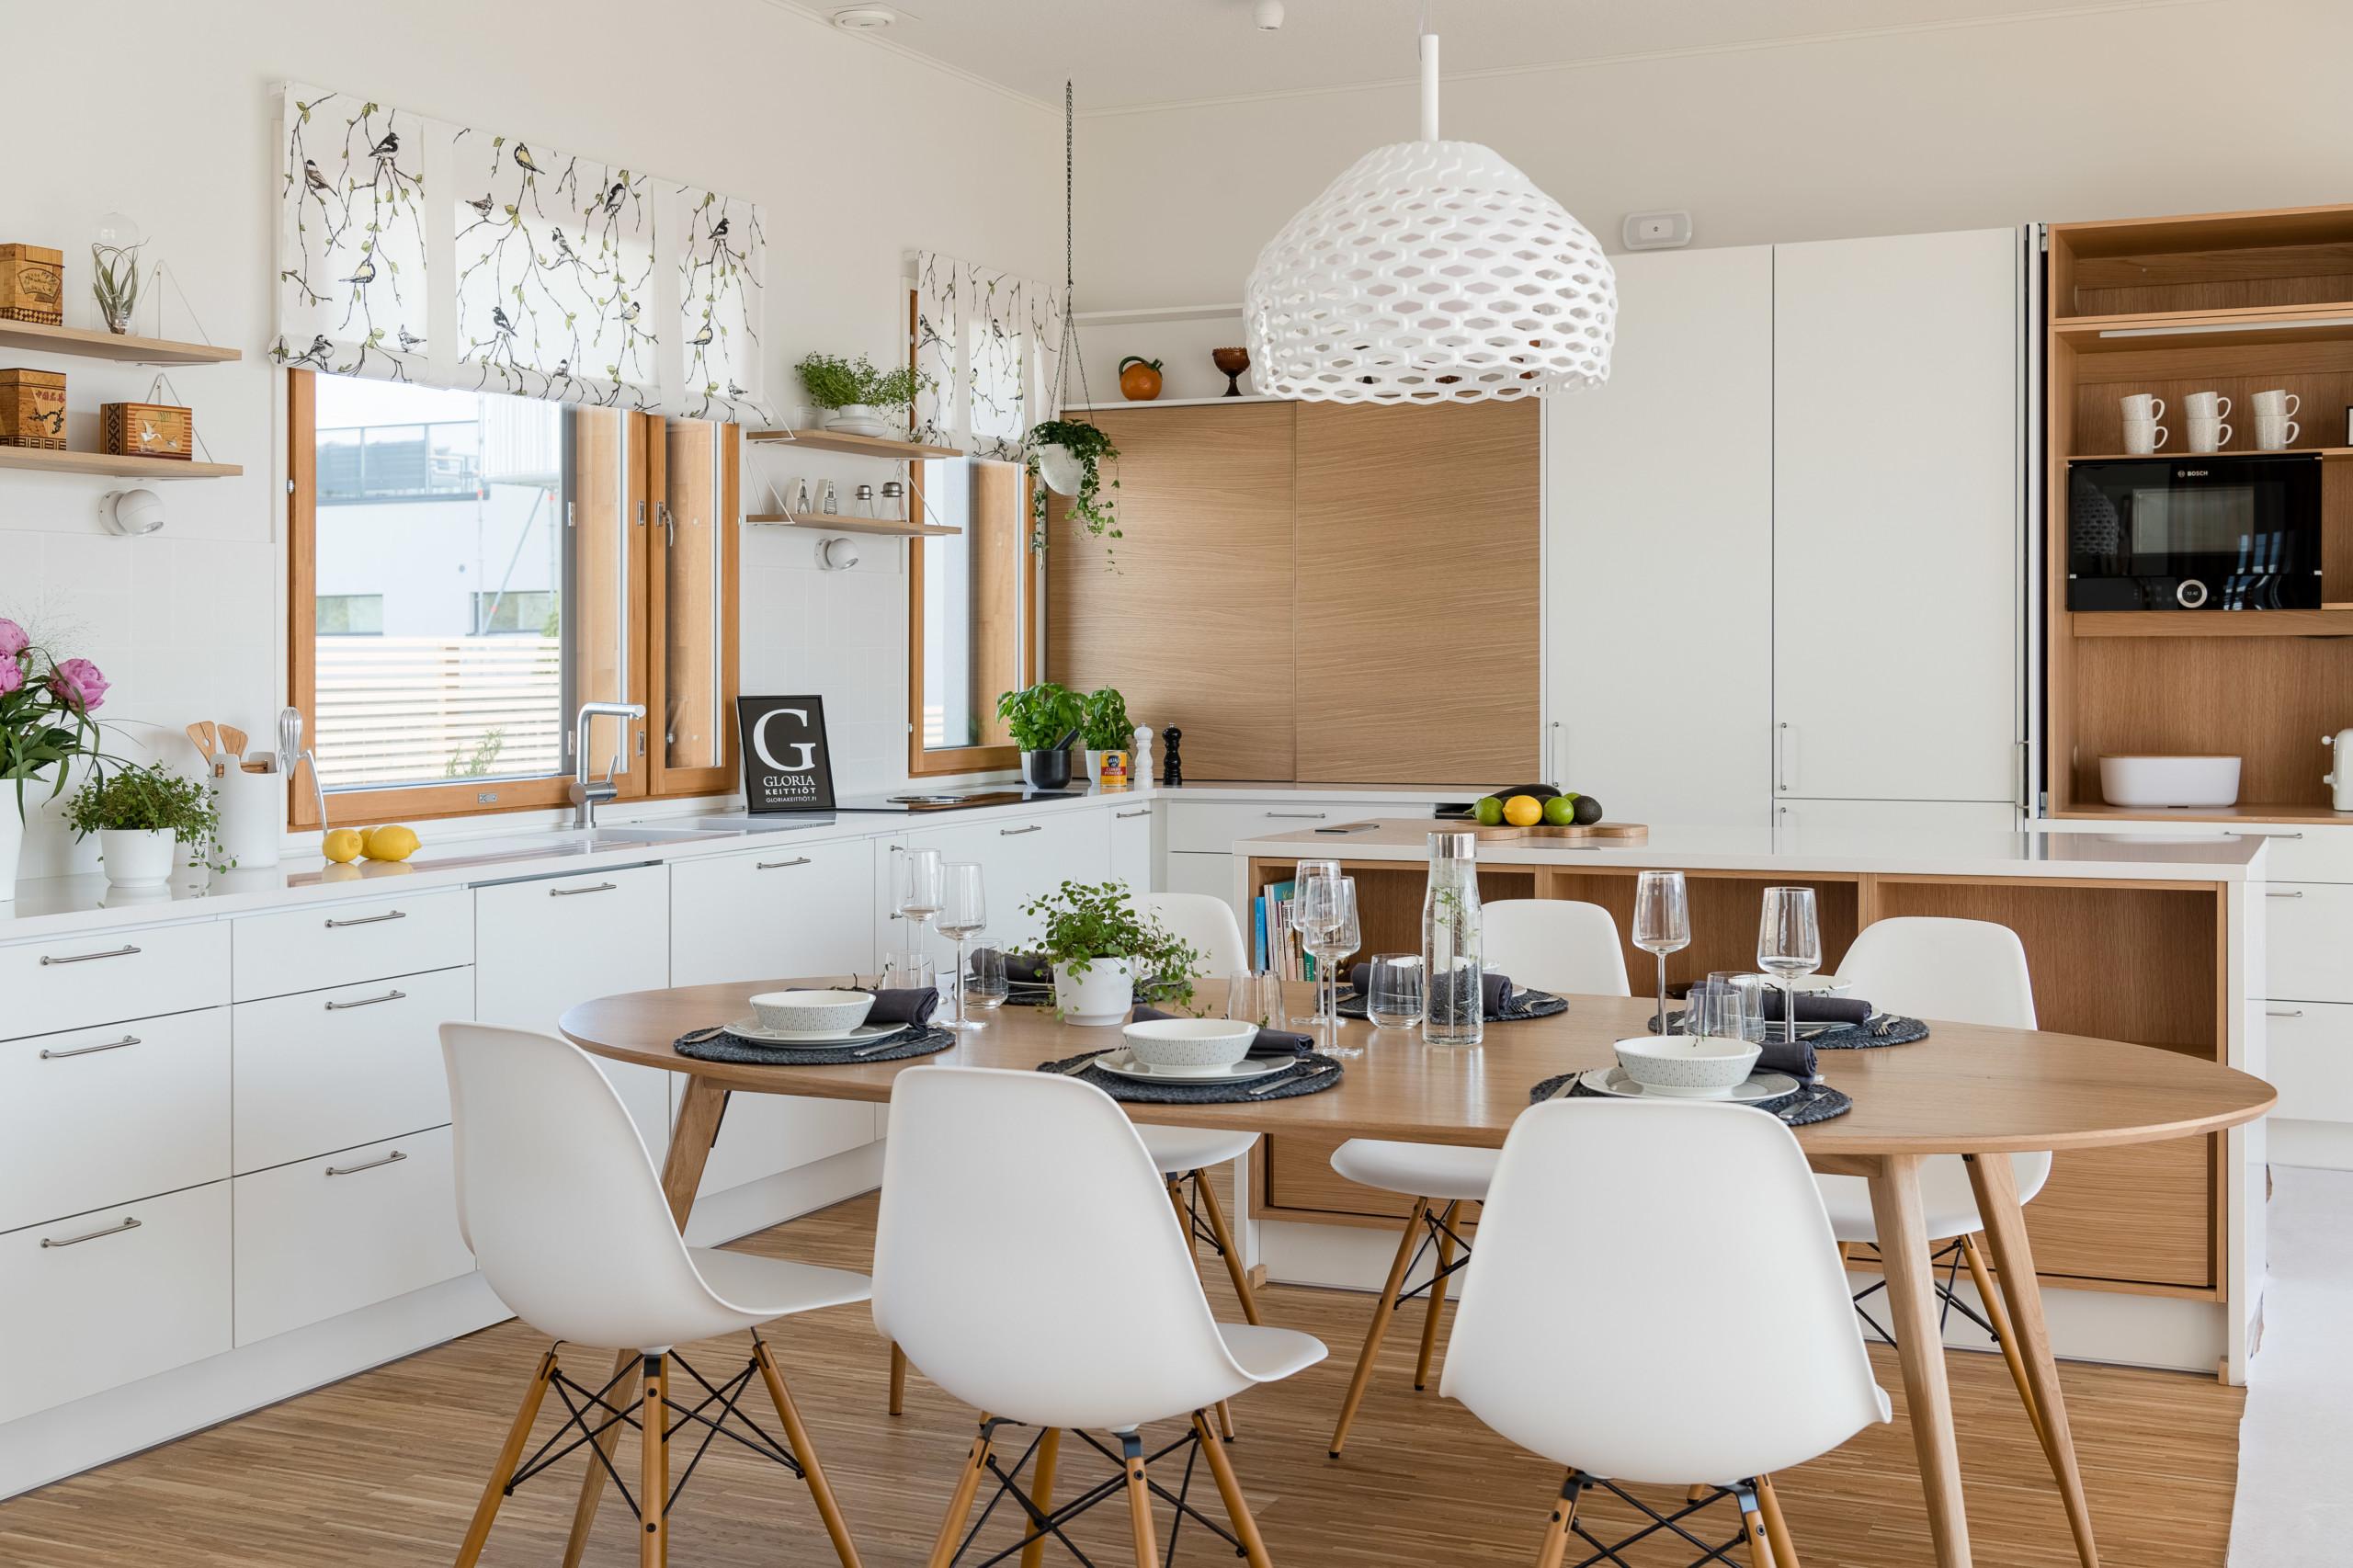 moderni keittiö talo lintula